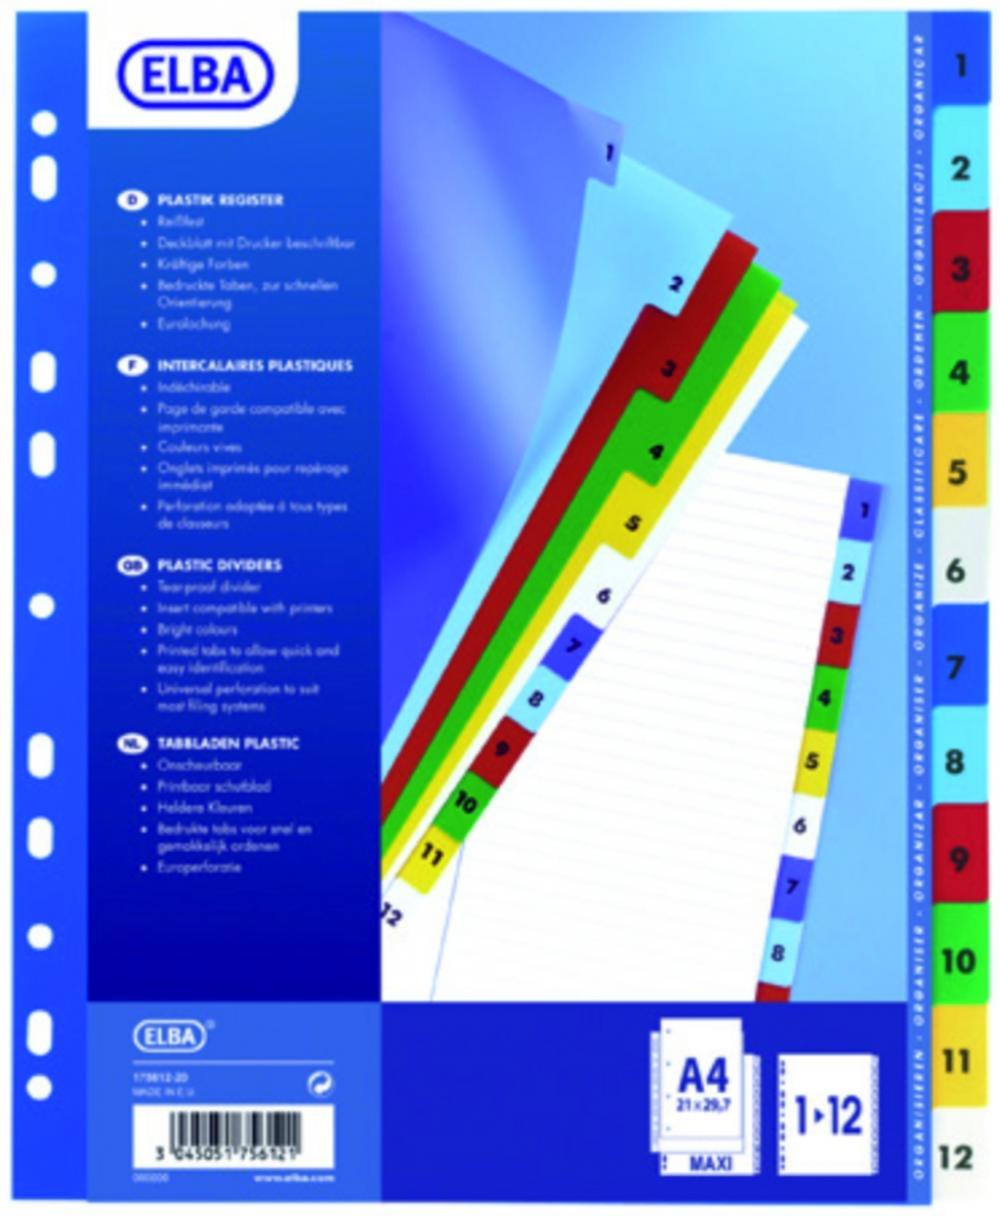 Index Plastic Color Numeric 1-12  A4 Xl  120 Microni  Elba